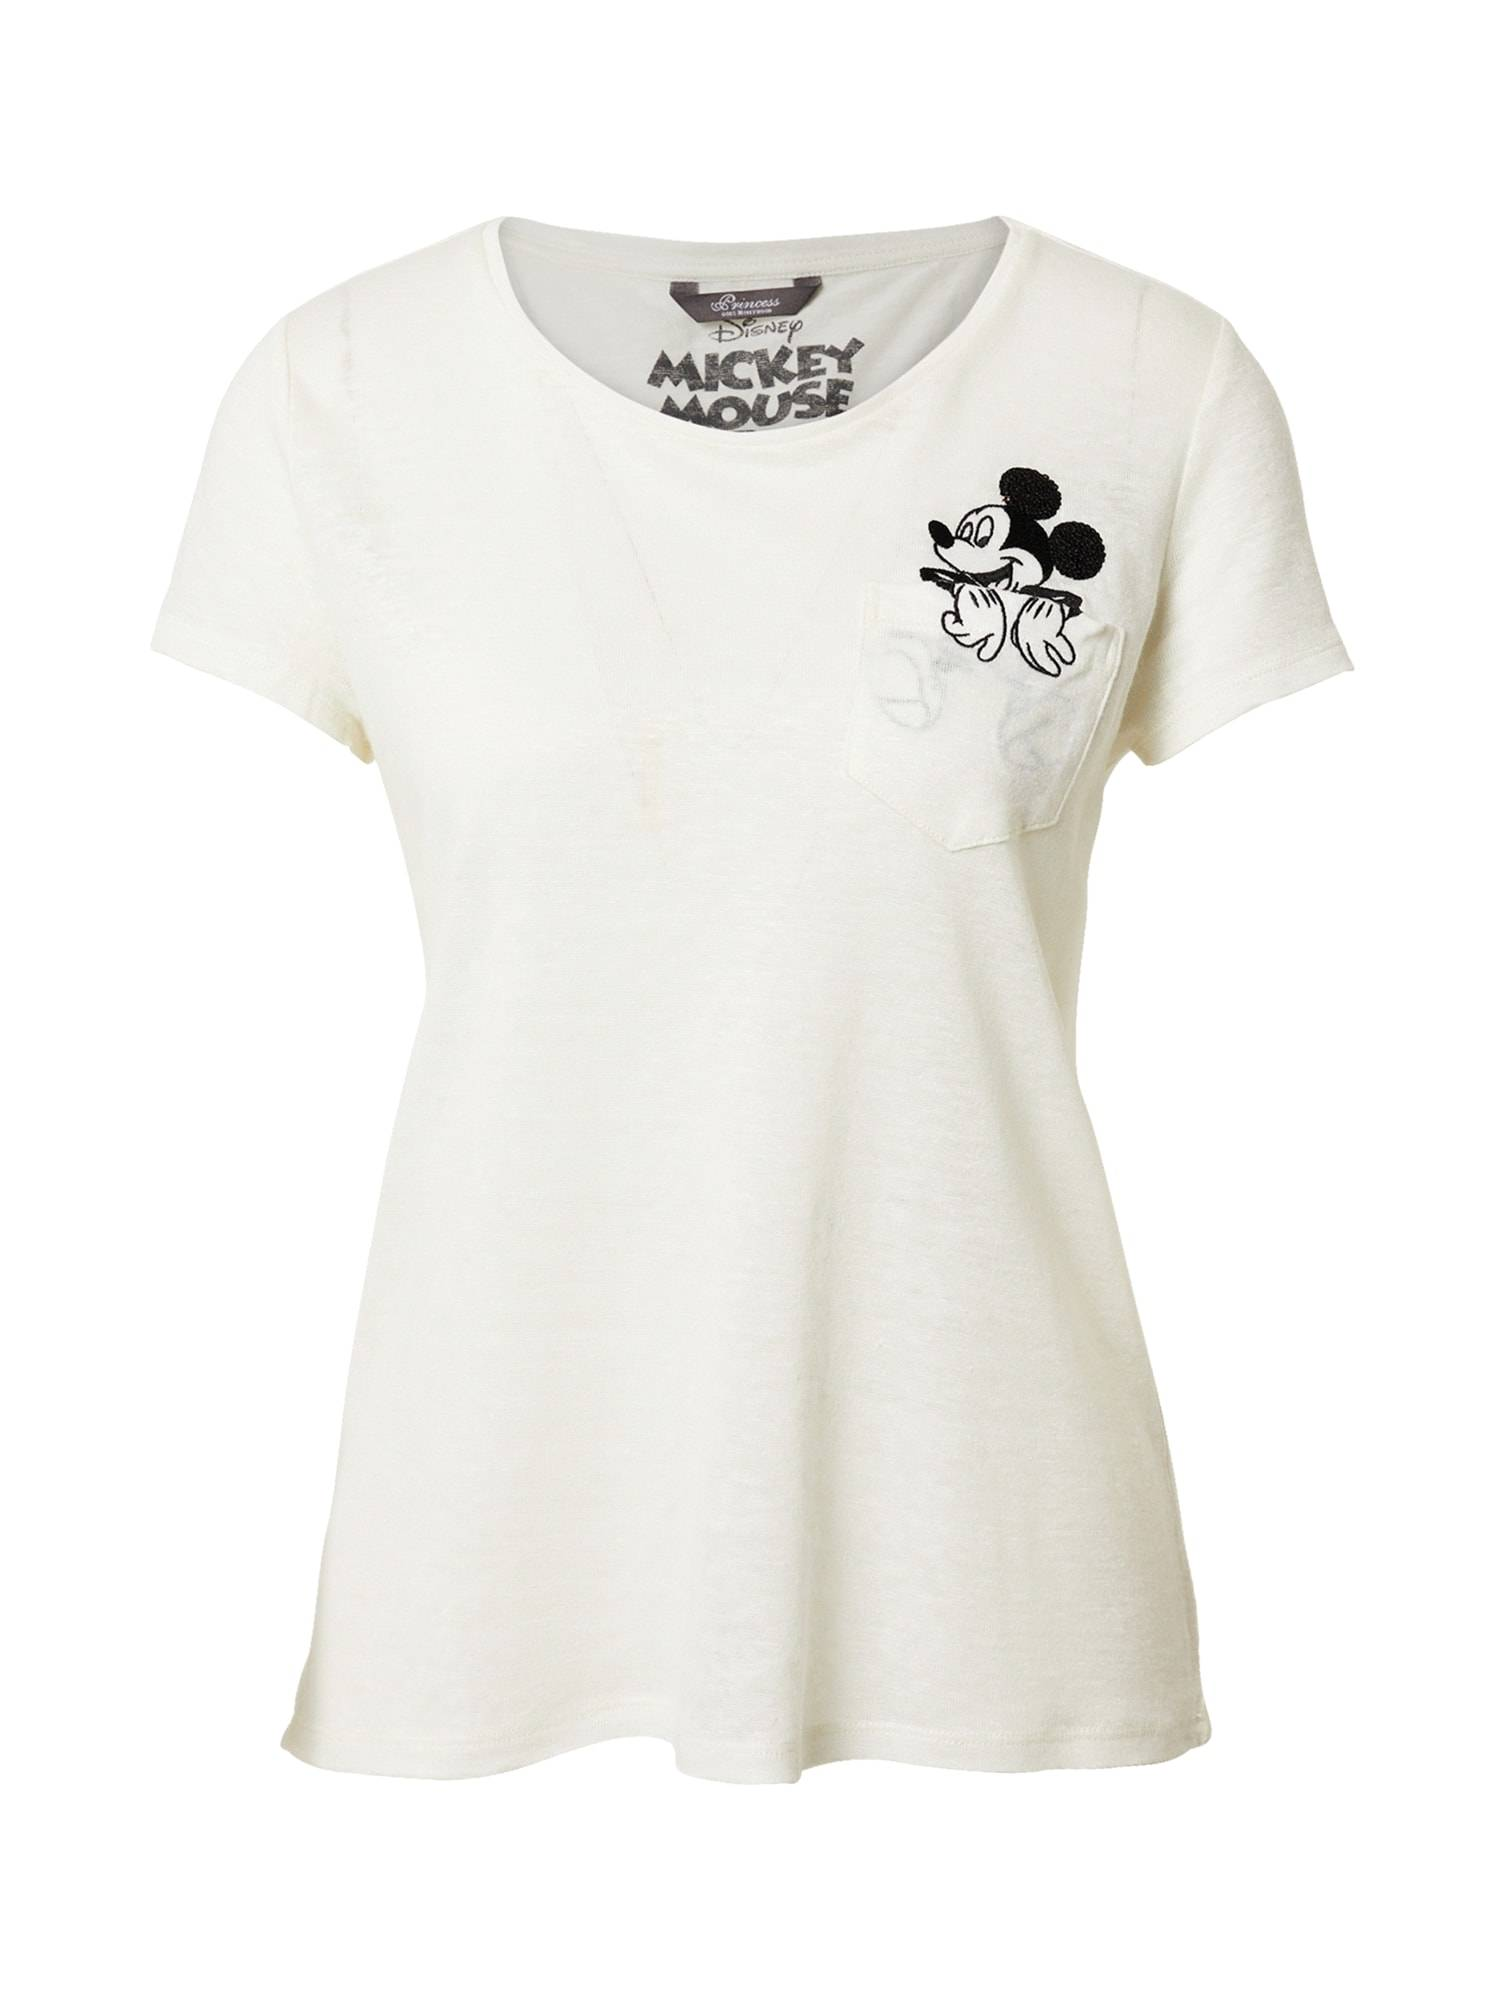 Princess T-shirt 'Mickey'  - Blanc - Taille: 38 - female